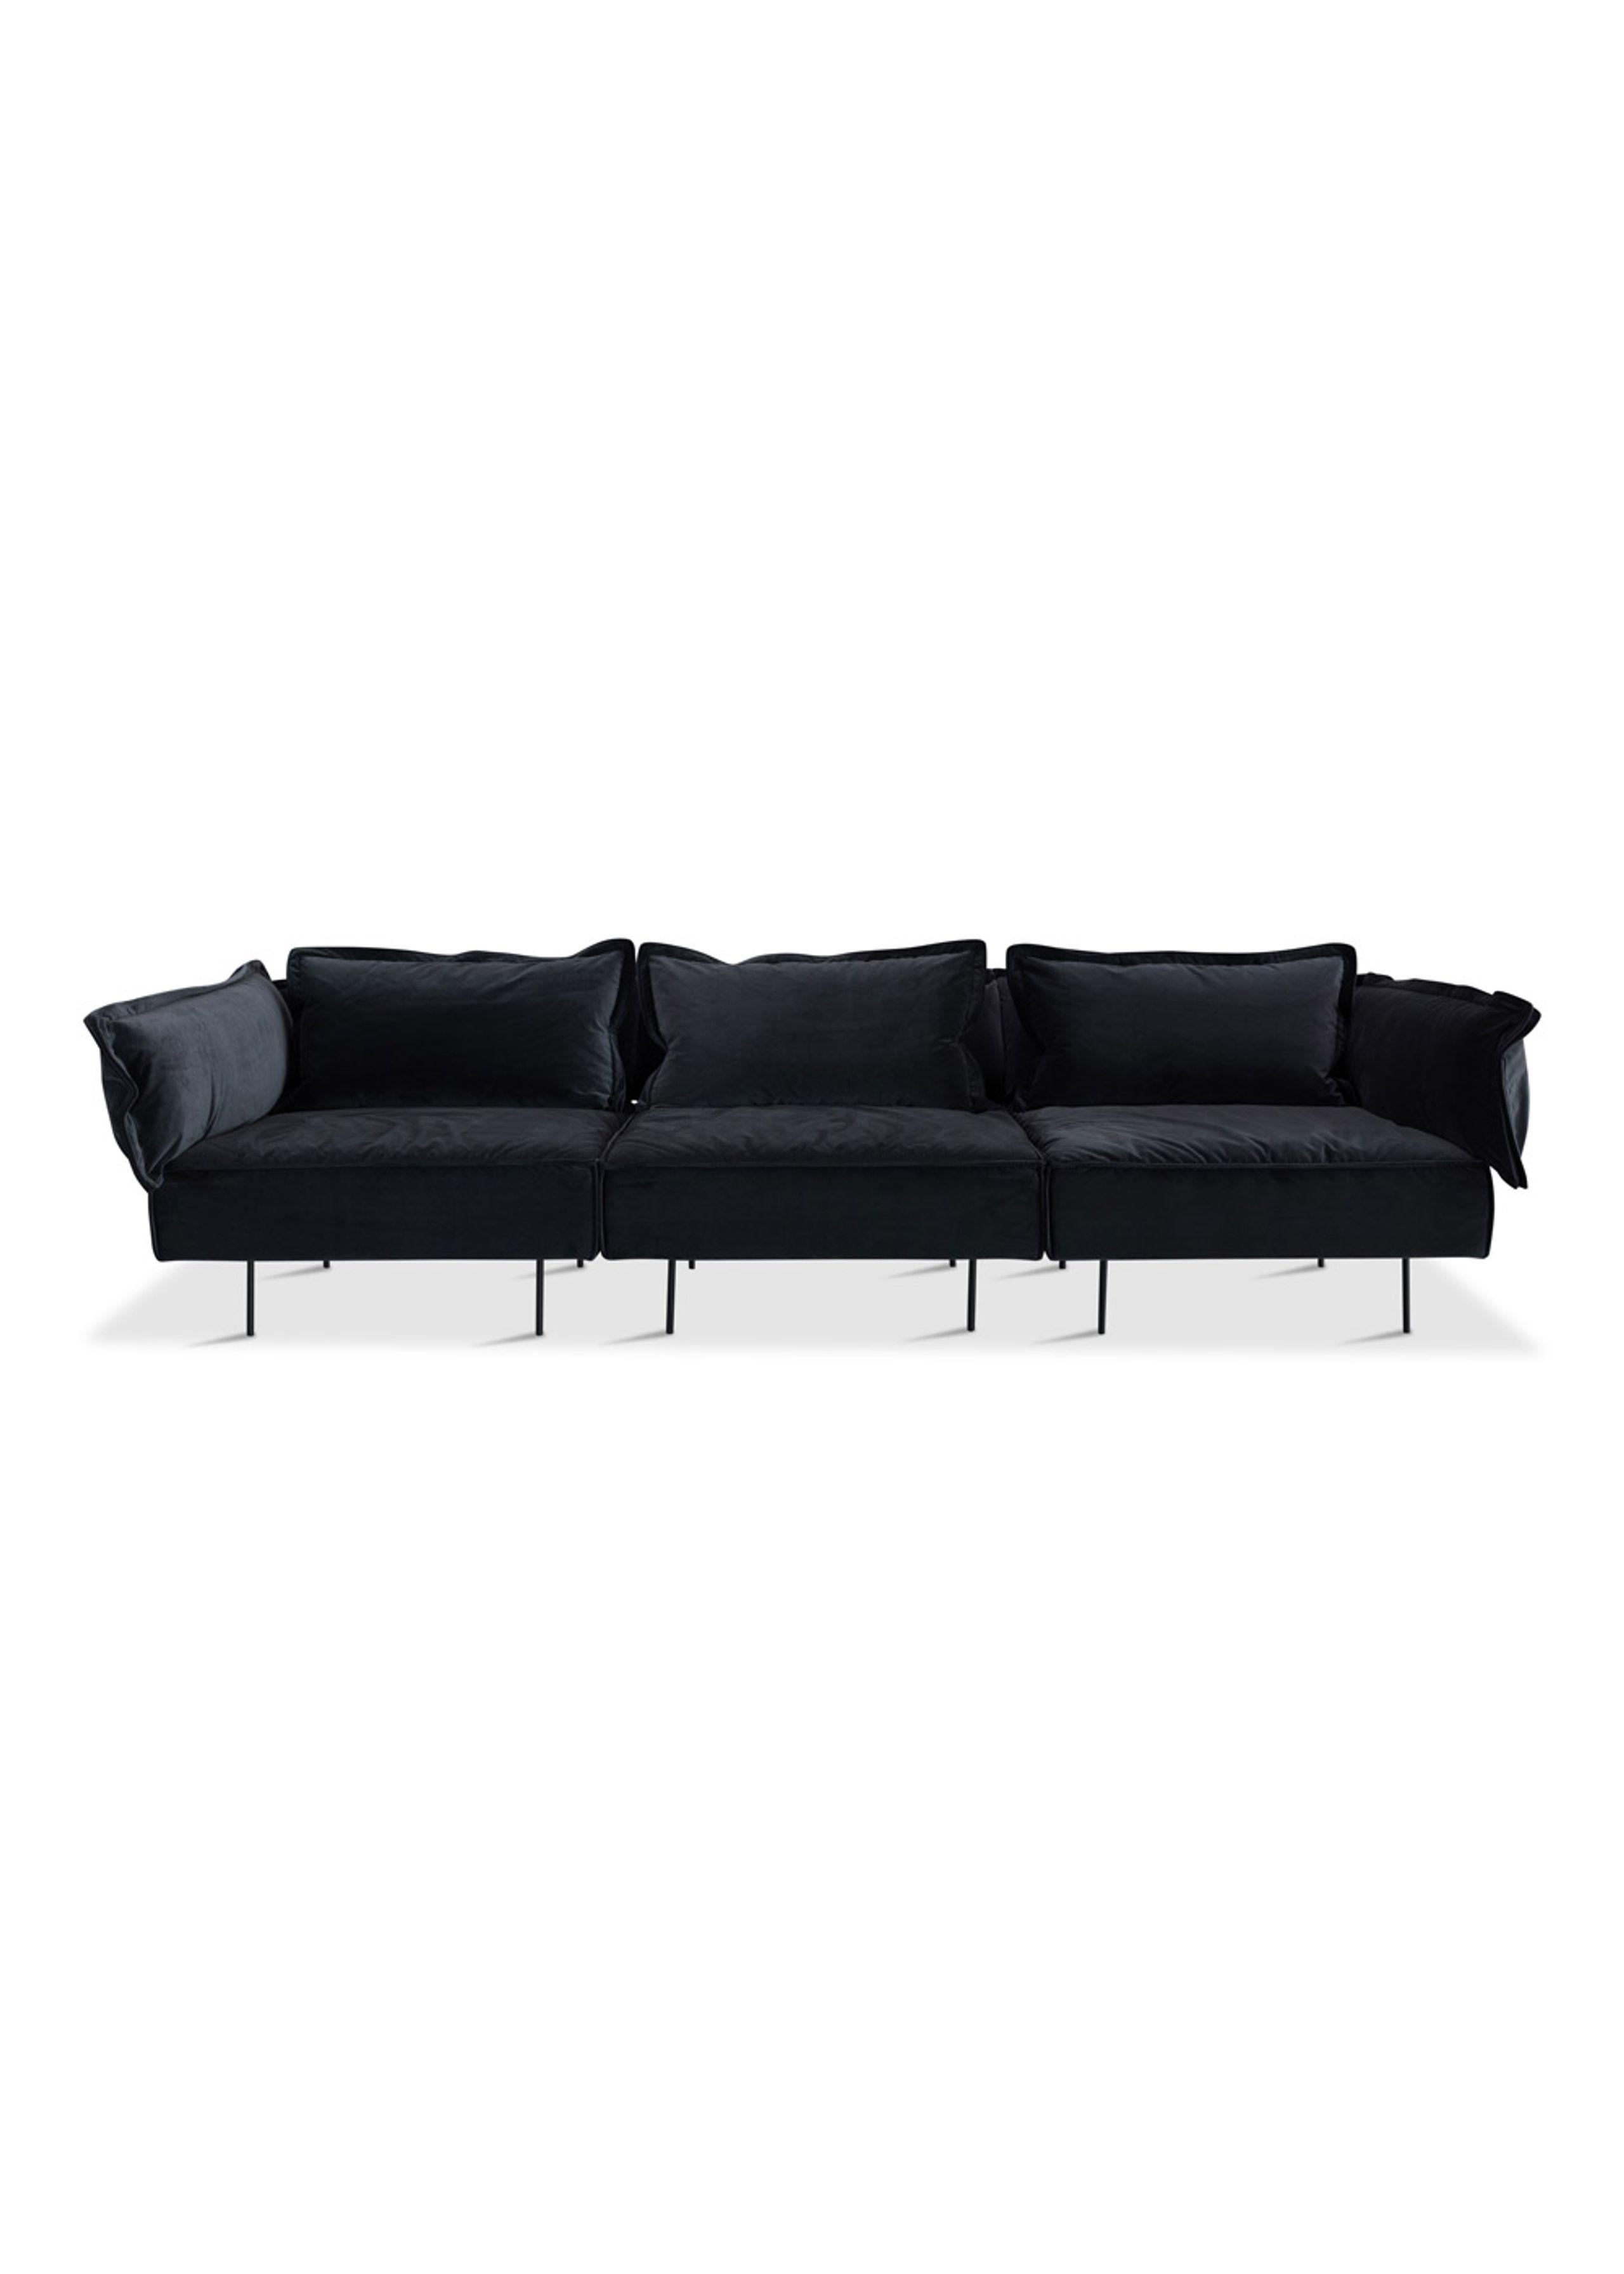 The Modular Sofa - 3-Seat Sofa by Emil Thorup